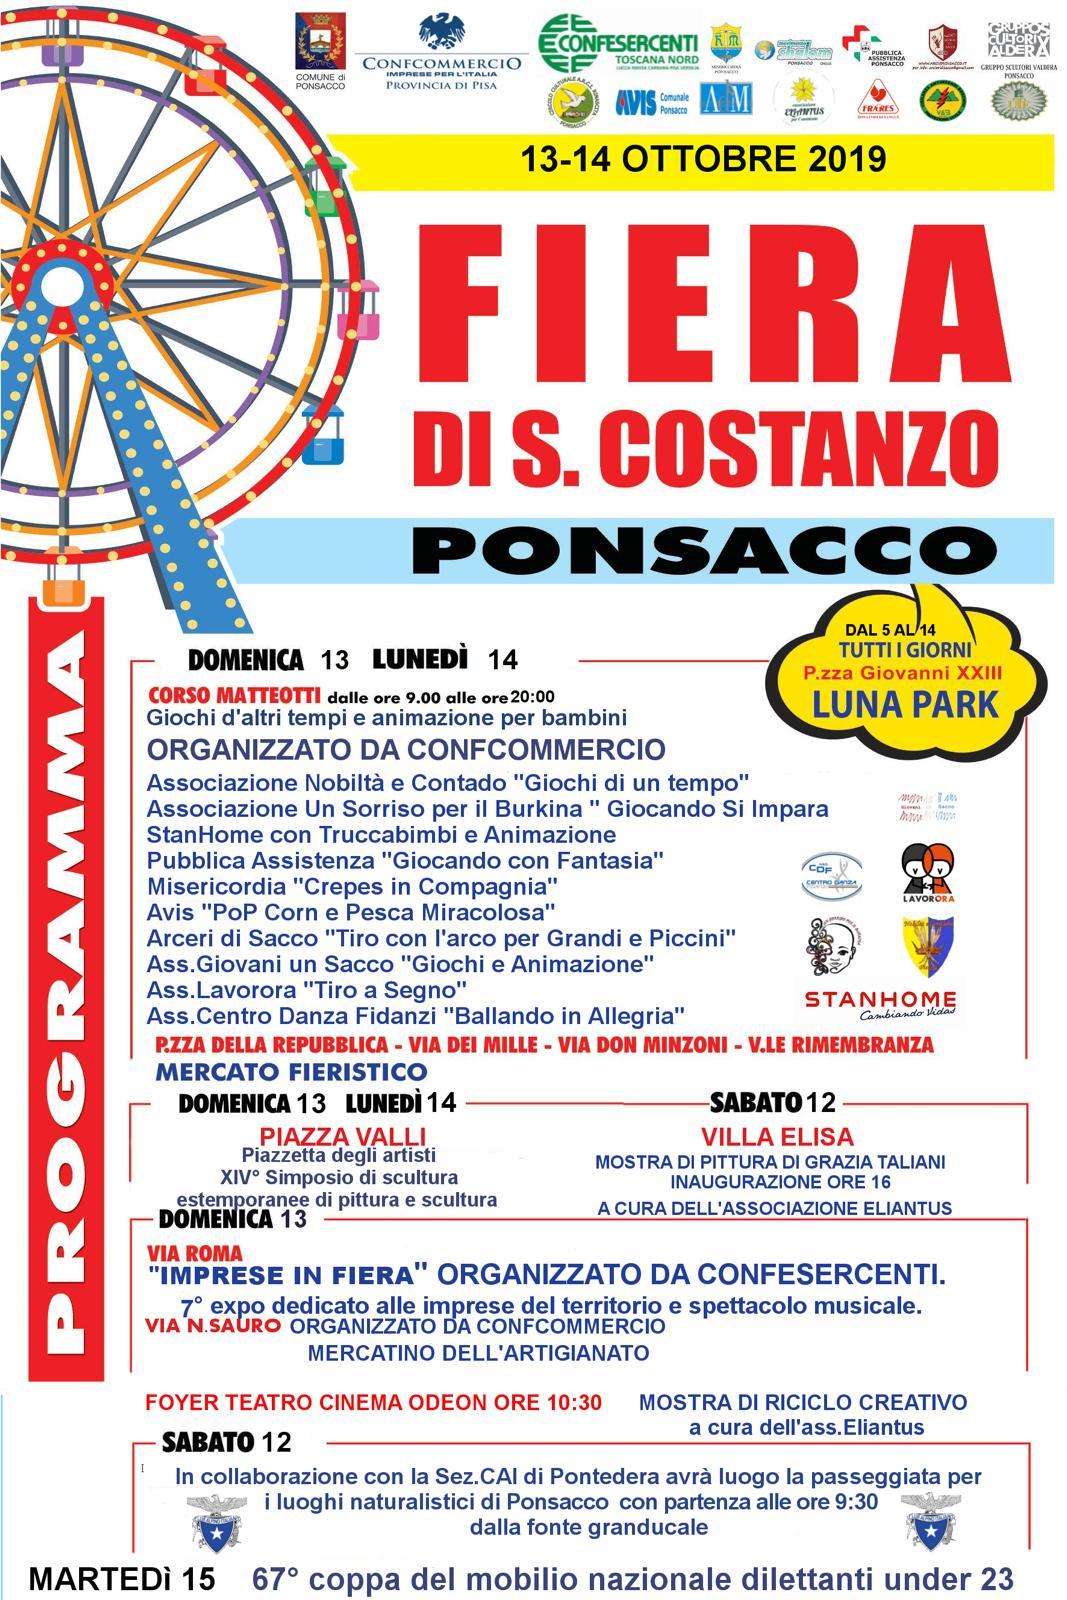 Fiera di San Costanzo | Ponsacco